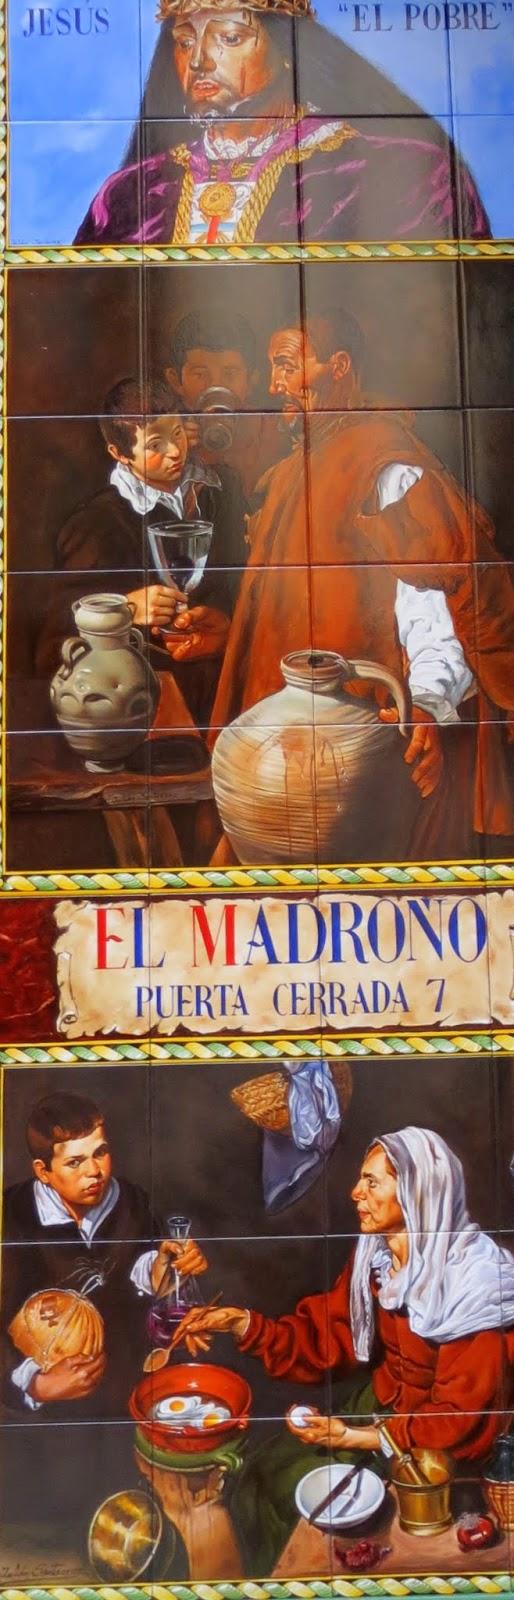 Puerta Cerrada, 7. Azulejos Julián Santa Cruz